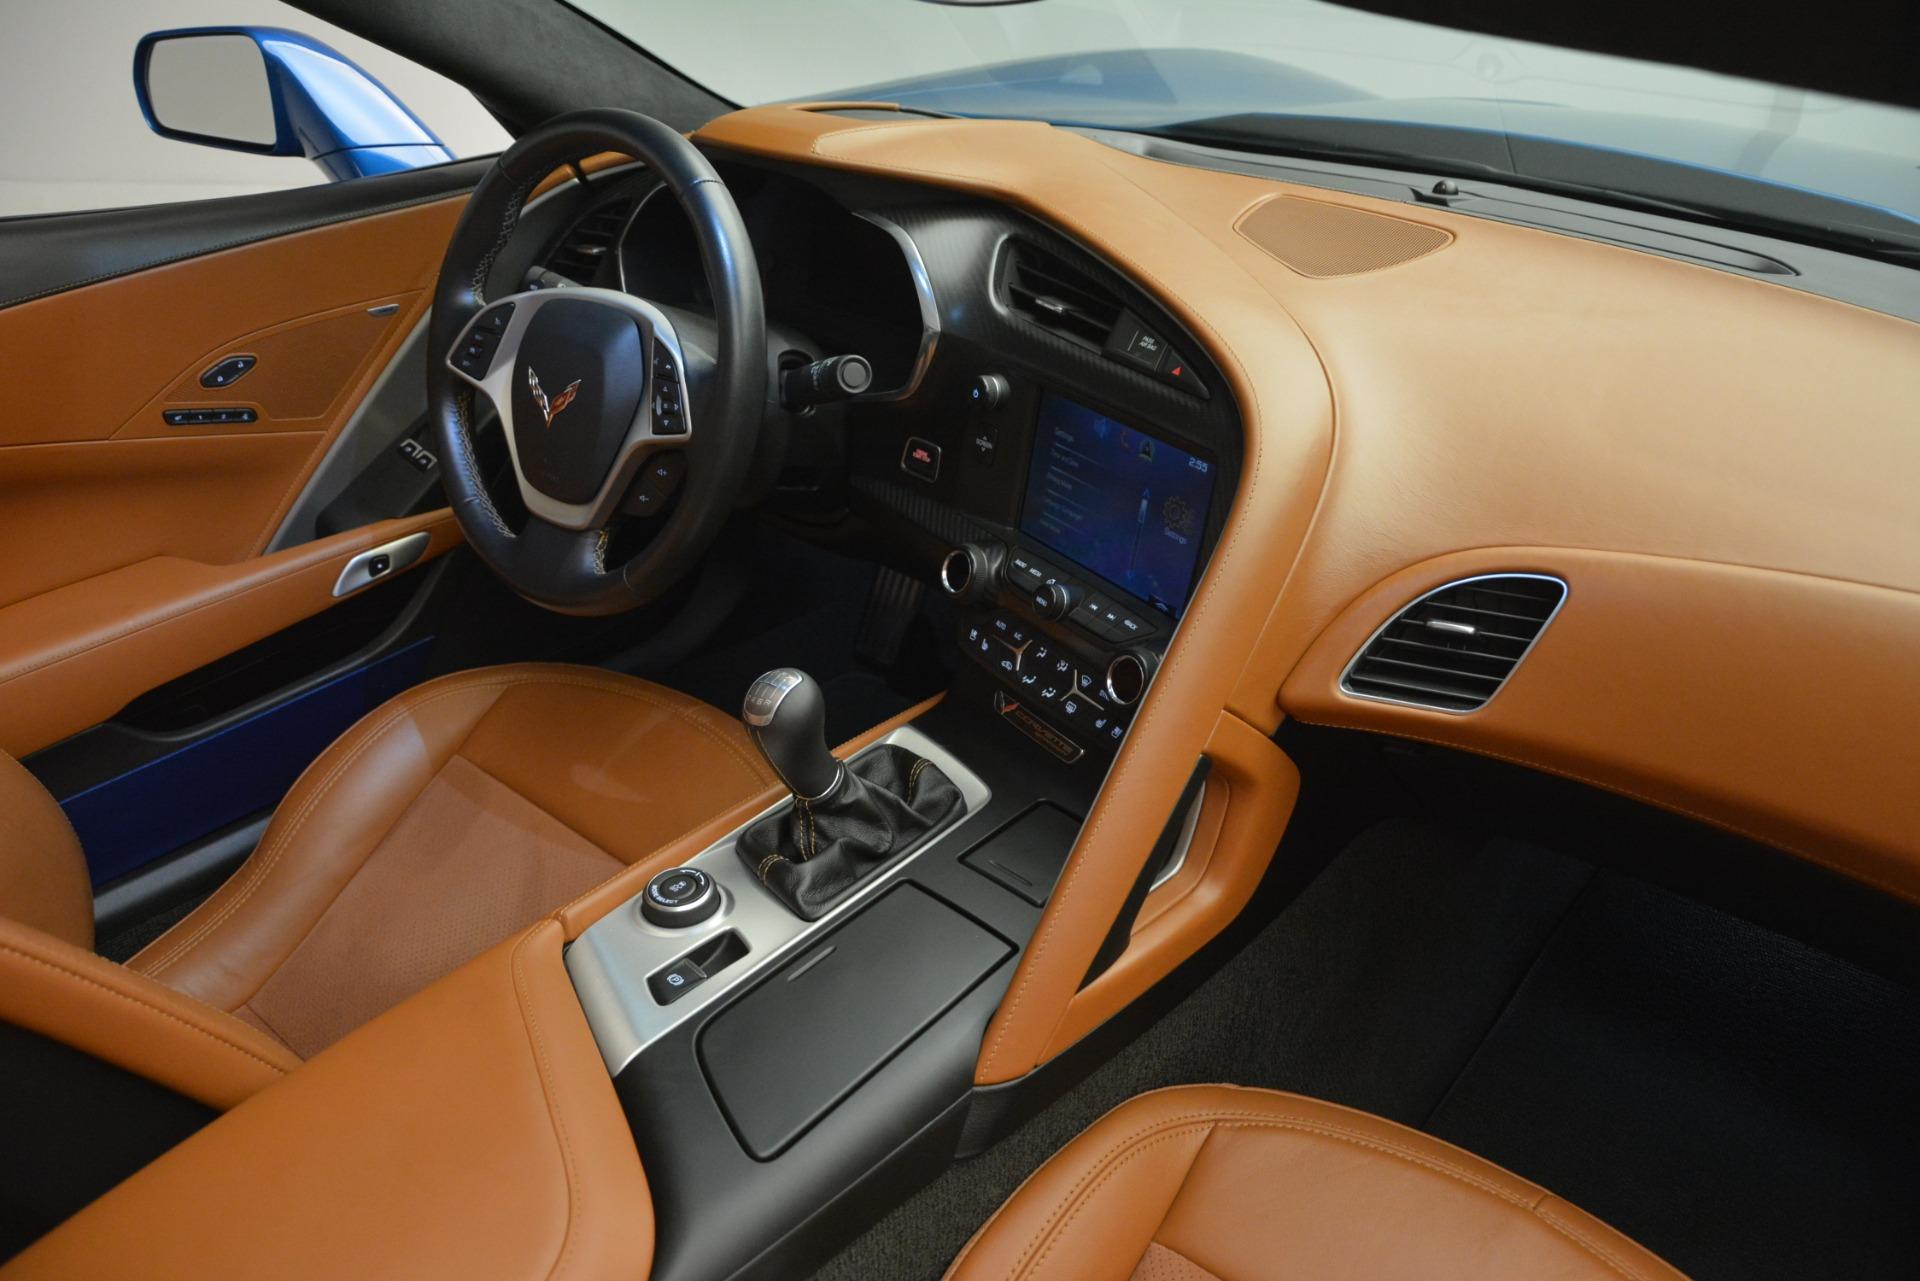 Used 2014 Chevrolet Corvette Stingray Z51 For Sale In Greenwich, CT 2703_p30